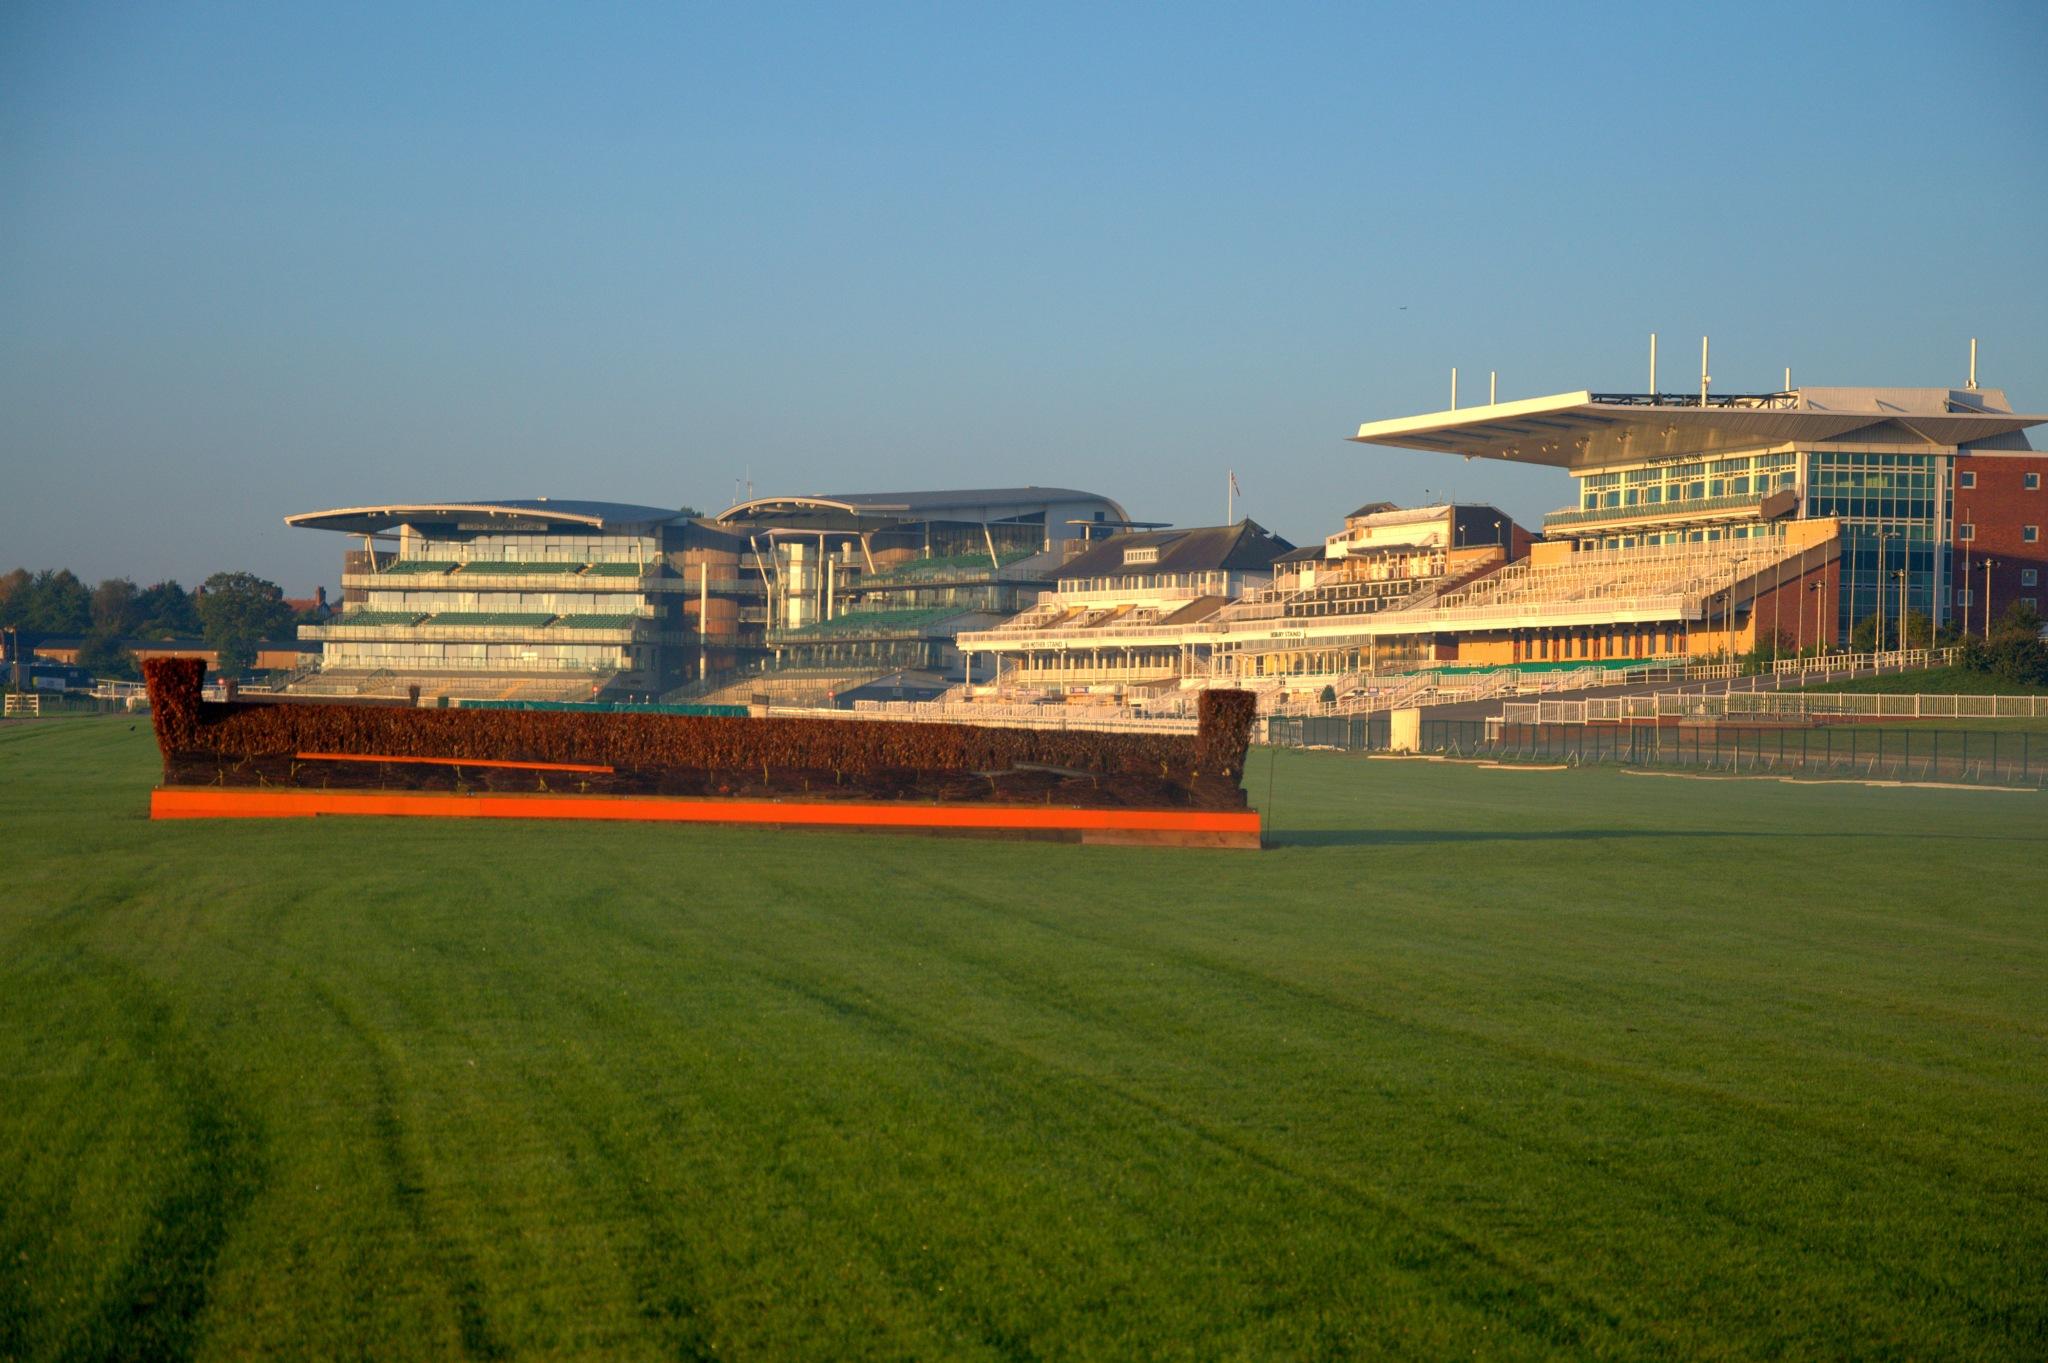 Aintree Racecourse Liverpool by MacMcNamee